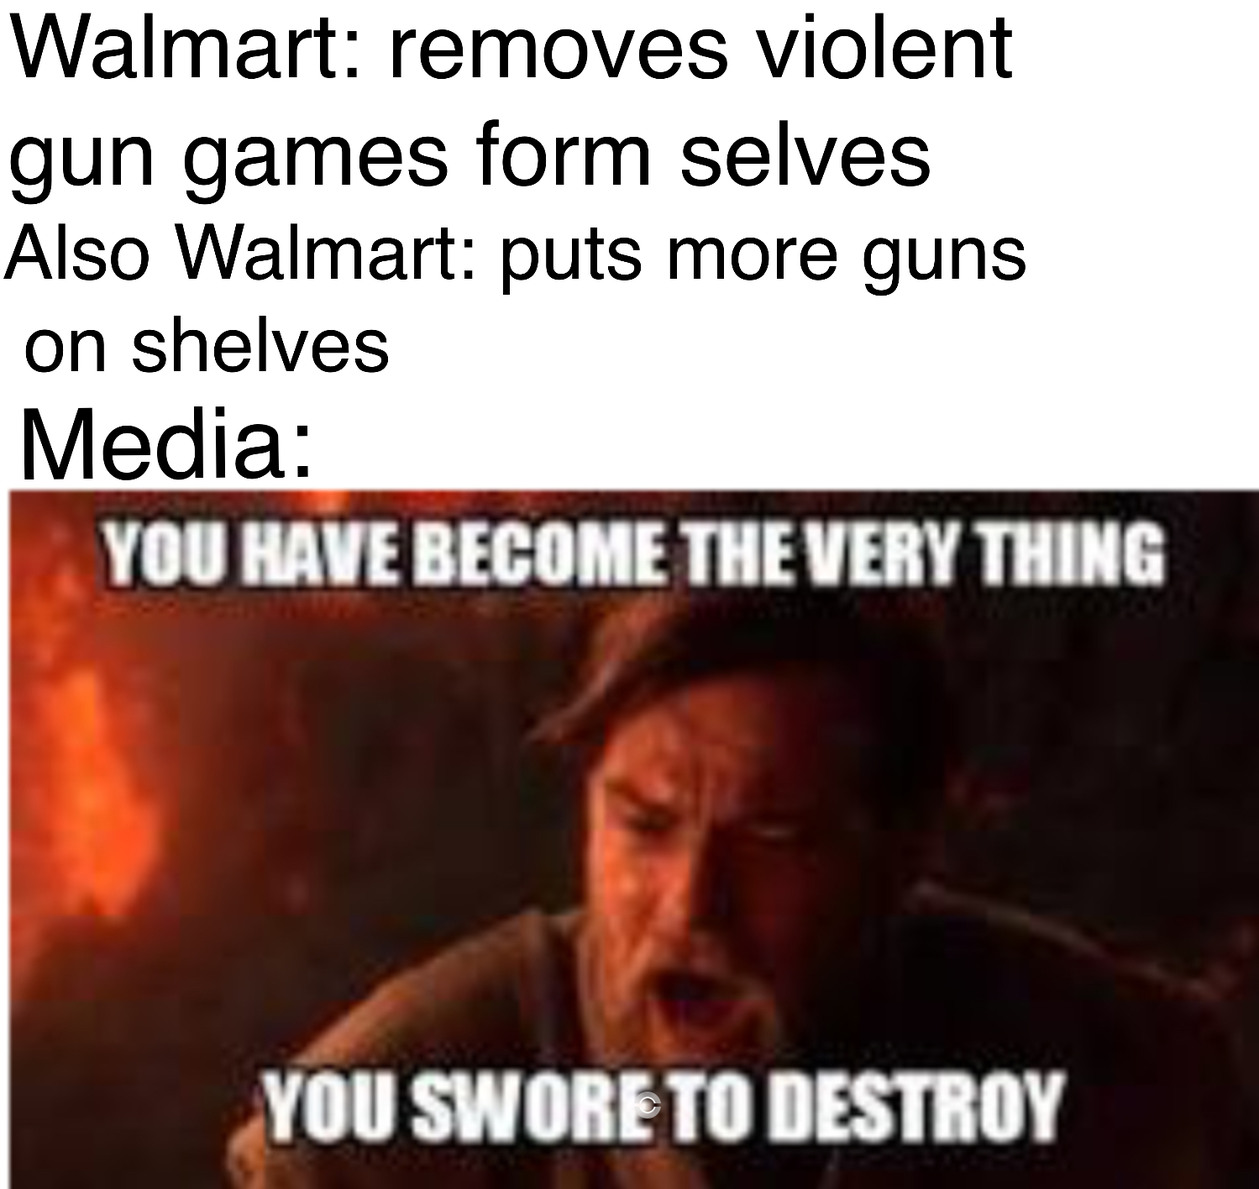 Well yes - meme